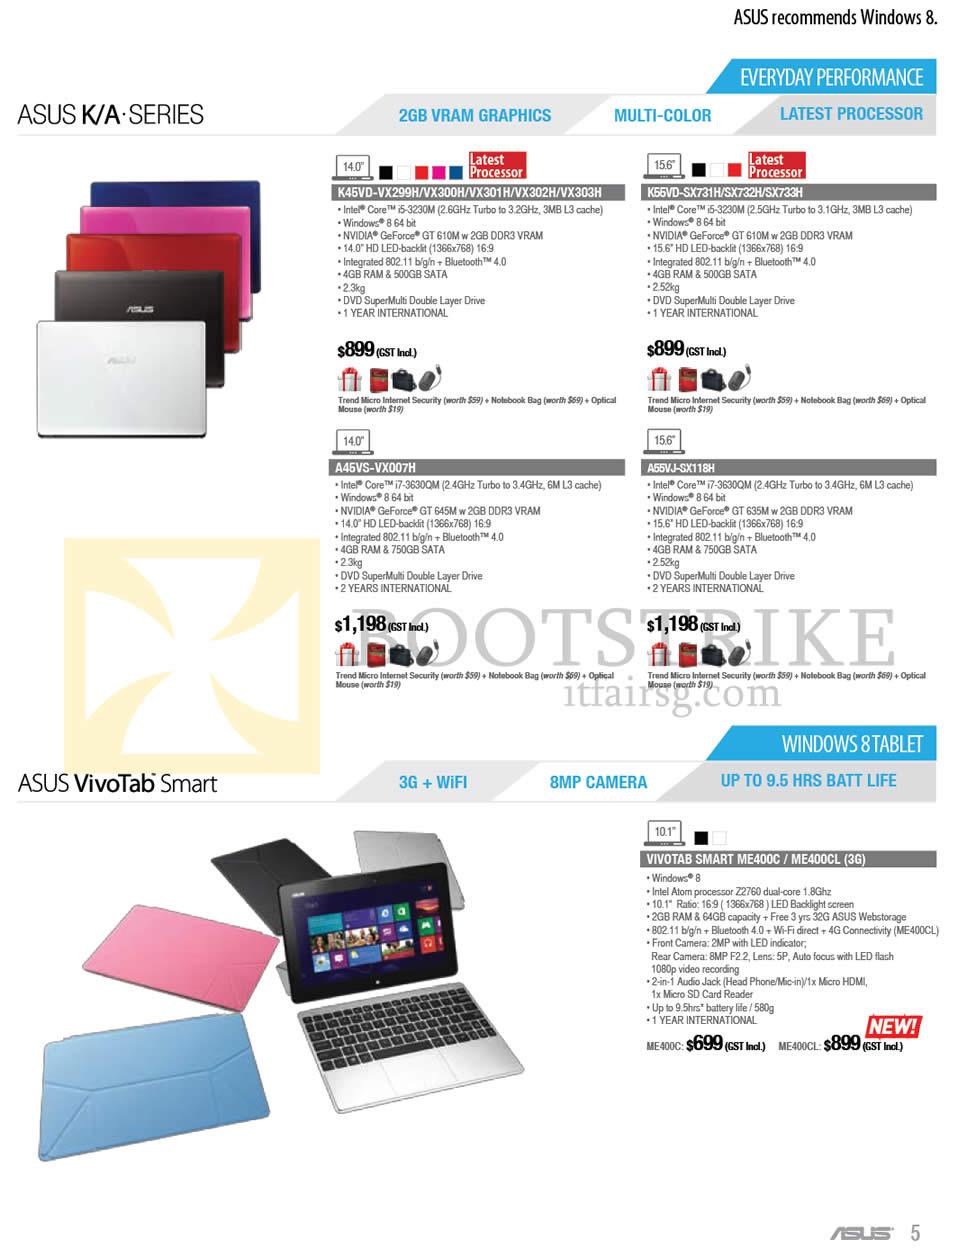 IT SHOW 2013 price list image brochure of ASUS Notebooks K45VD-VX299H VX300H VX301H VX302H VX303H, K55VD-SX731H SX732H SX733H, A45VS-VX007H, A55VJ-SX118H, Tablet VivoTab Smart ME400C ME400CL 3G